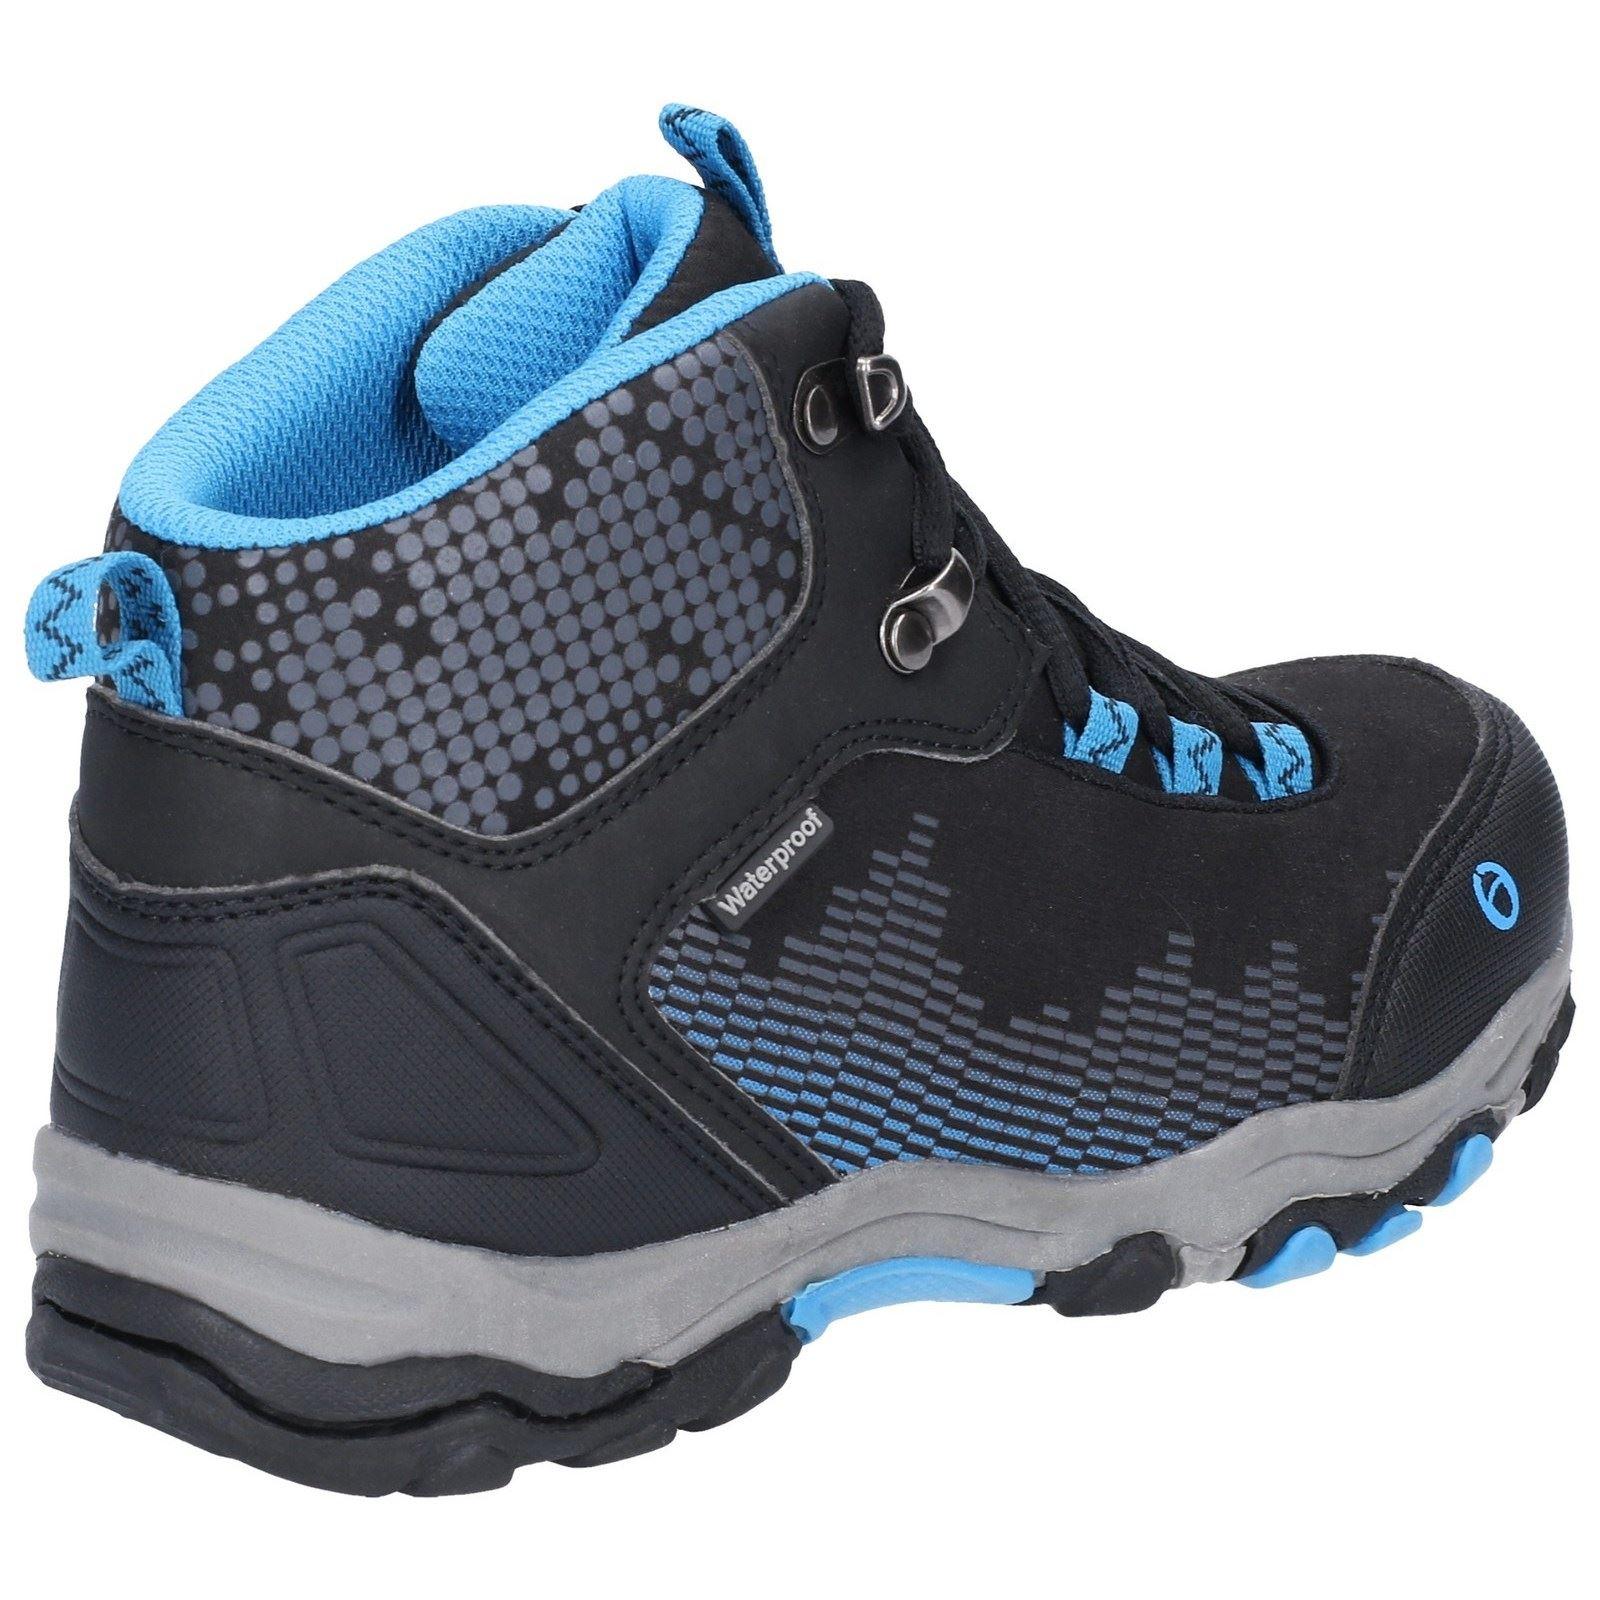 500d2be0e34 Details about Cotswold Ducklington Lace Black/Blue Childrens Hiking Boots  Textile+Synthetic